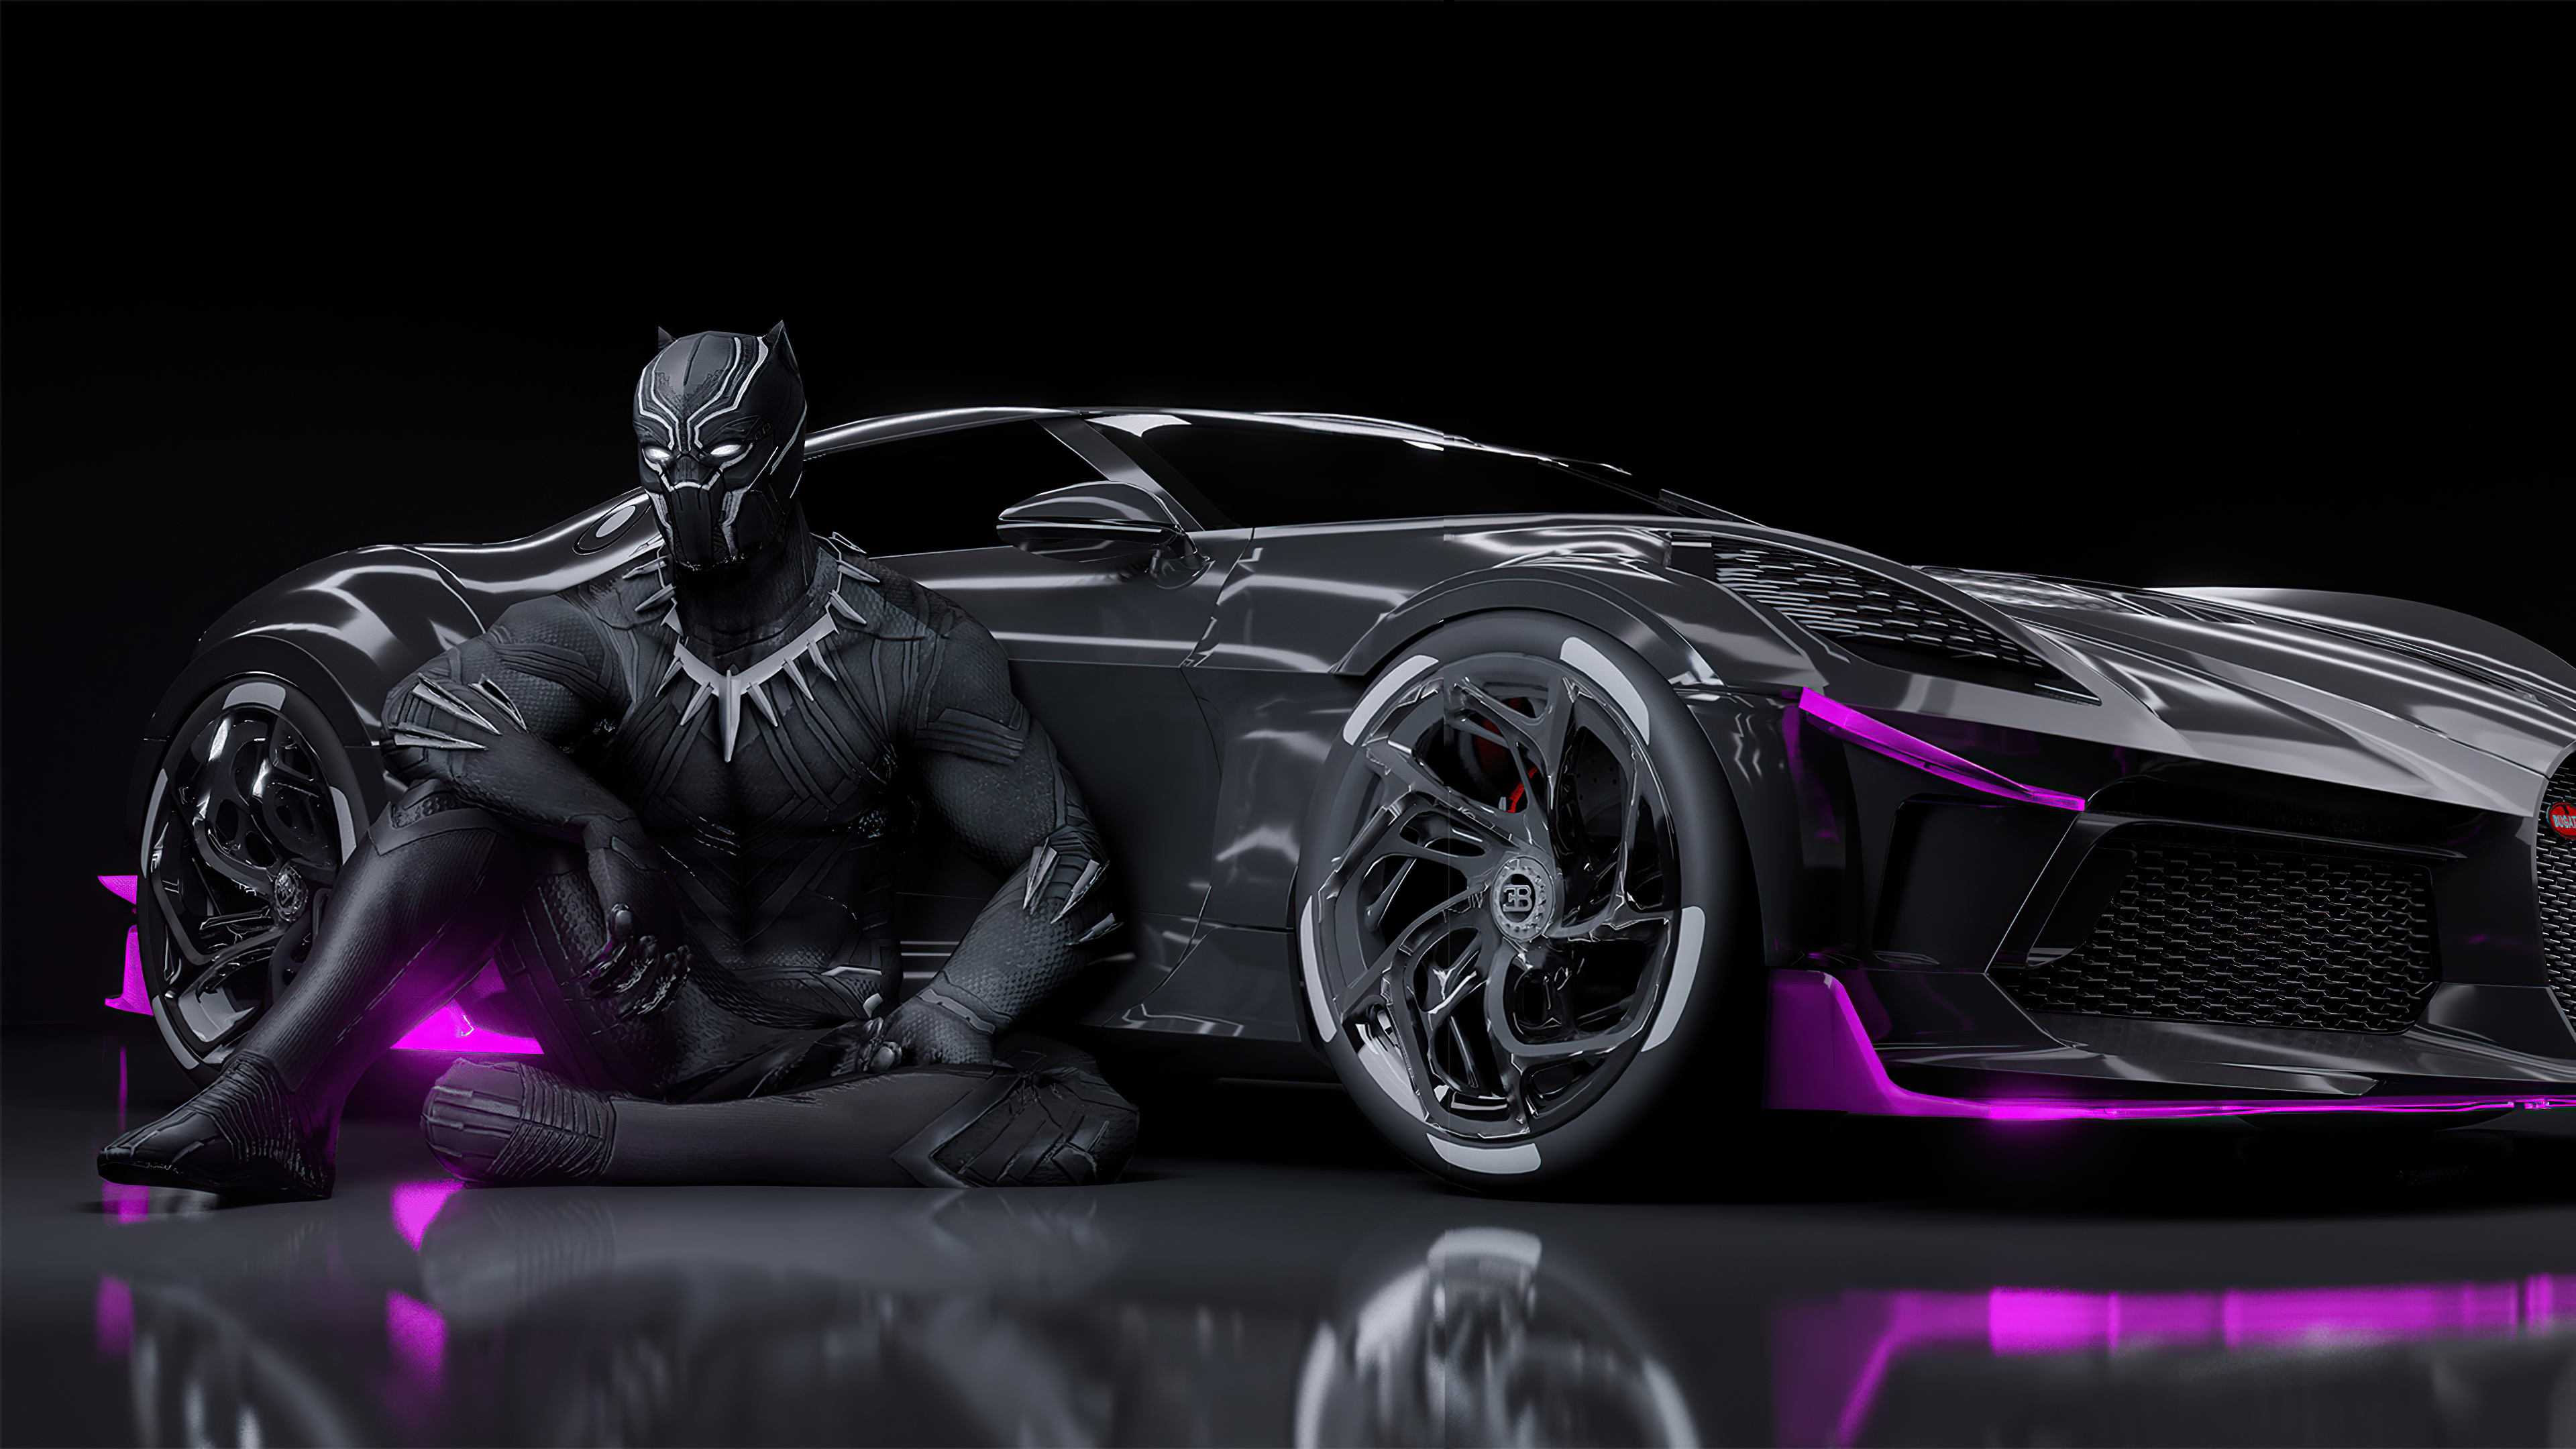 black panther bugatti chiron la voiture noire 4k 1608819638 - Black Panther Bugatti Chiron La Voiture Noire 4k - Black Panther Bugatti Chiron La Voiture Noire 4k wallpapers